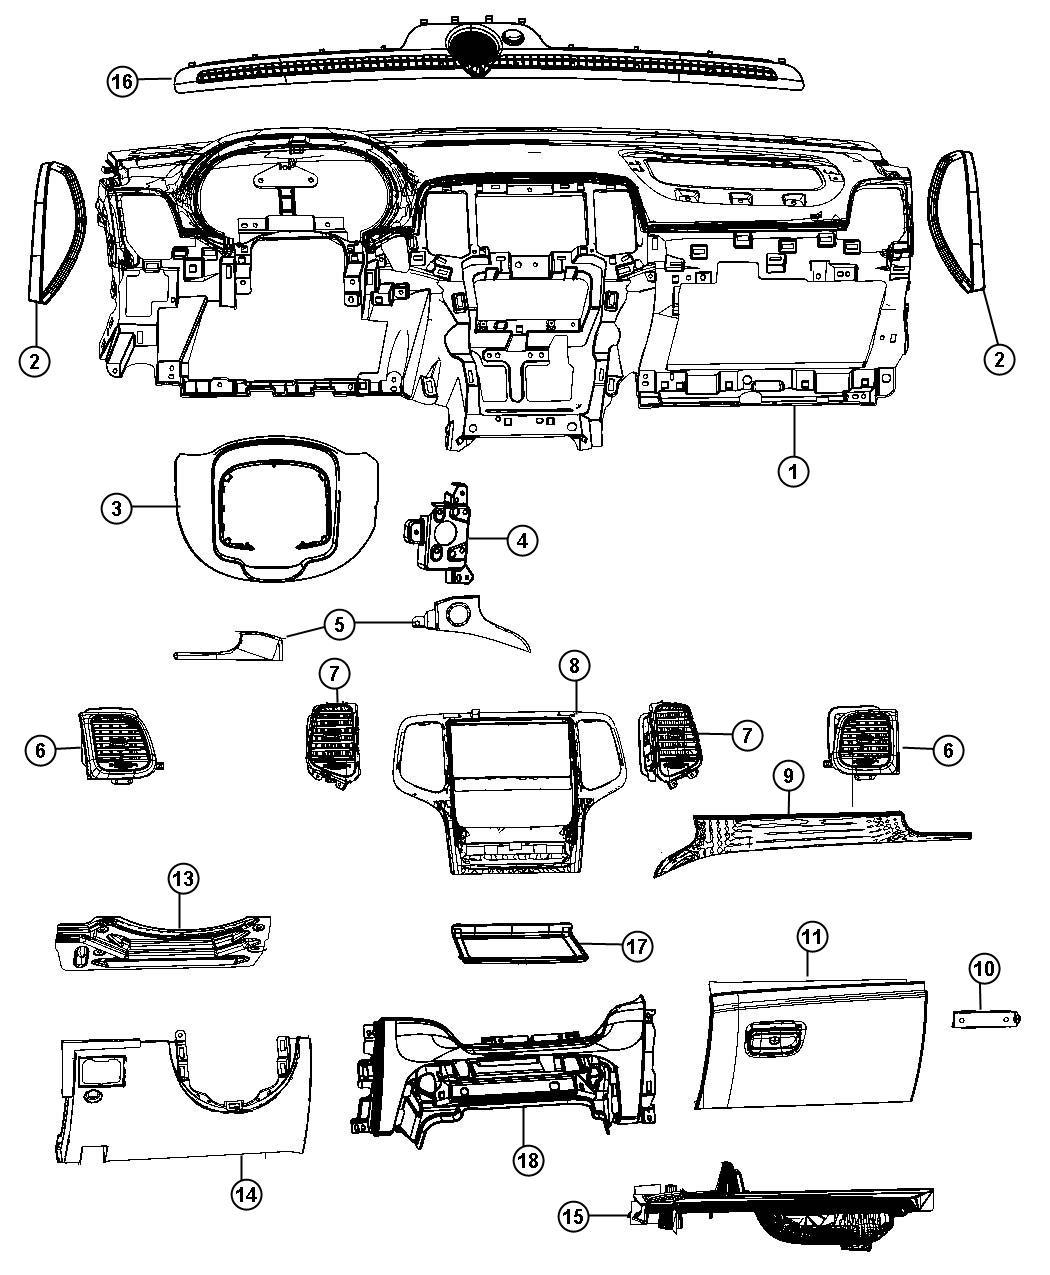 2013 Dodge Durango Mat. Storage tray. Citadel, [x5], [x9